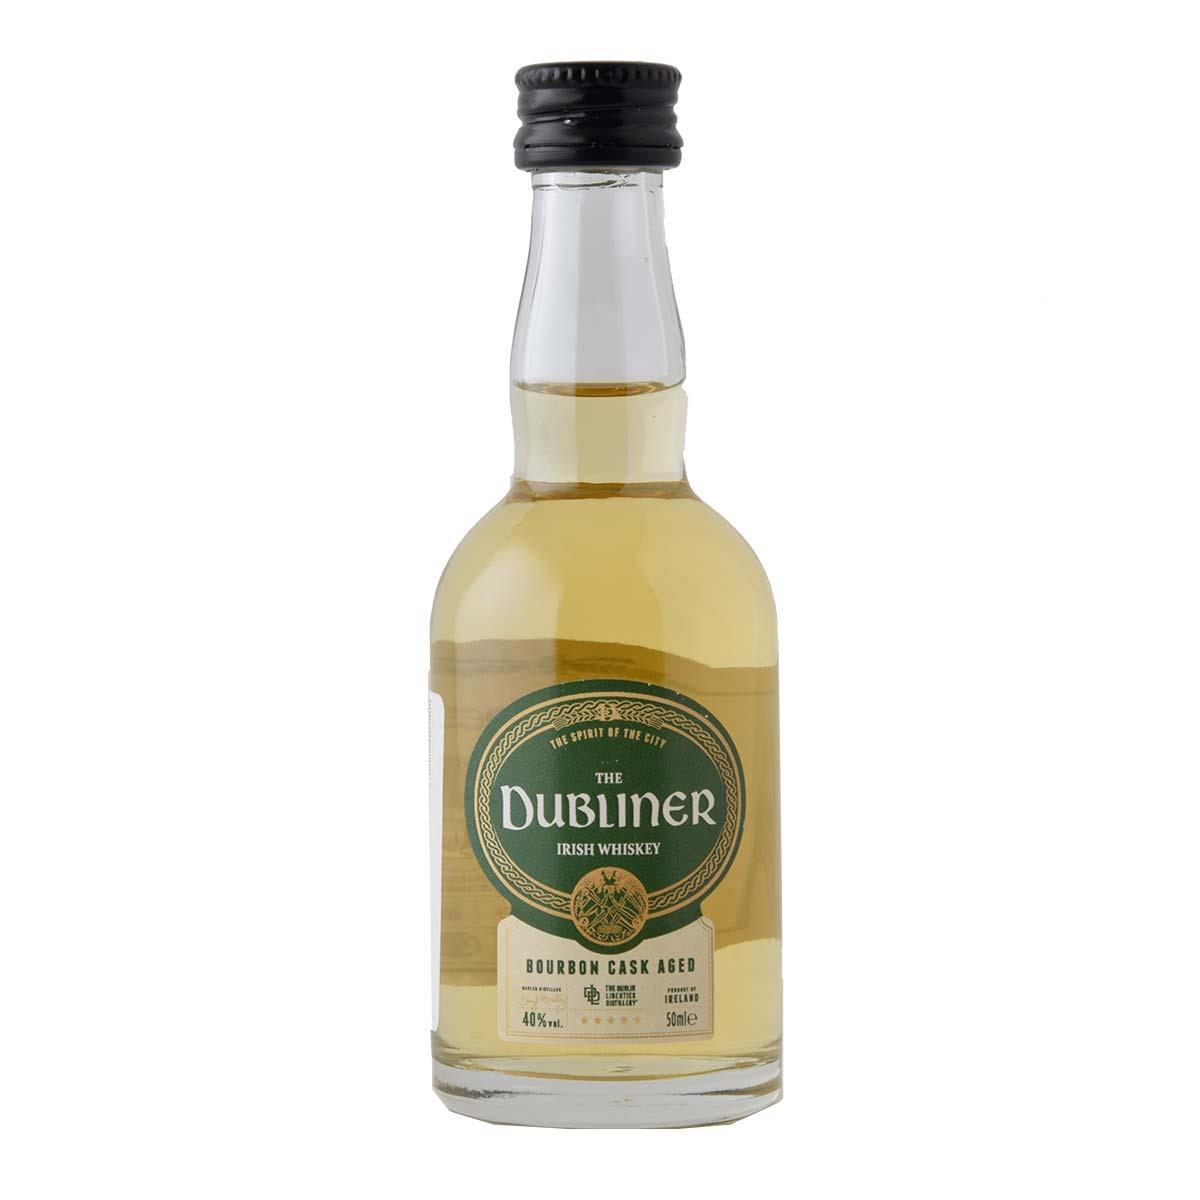 Dubliner Irish Bourbon Cask Aged 50ml